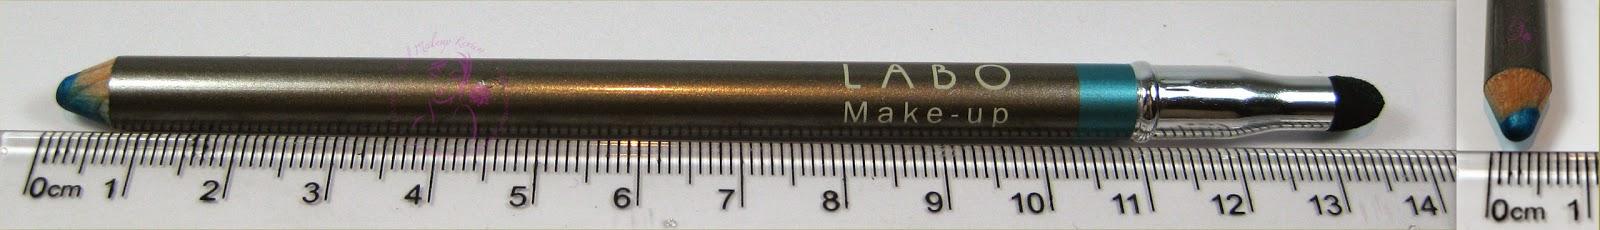 Labo Make-Up - Fashion Treatment Eye Pencil n° 12 -Turquoise/Turchese - dimensioni